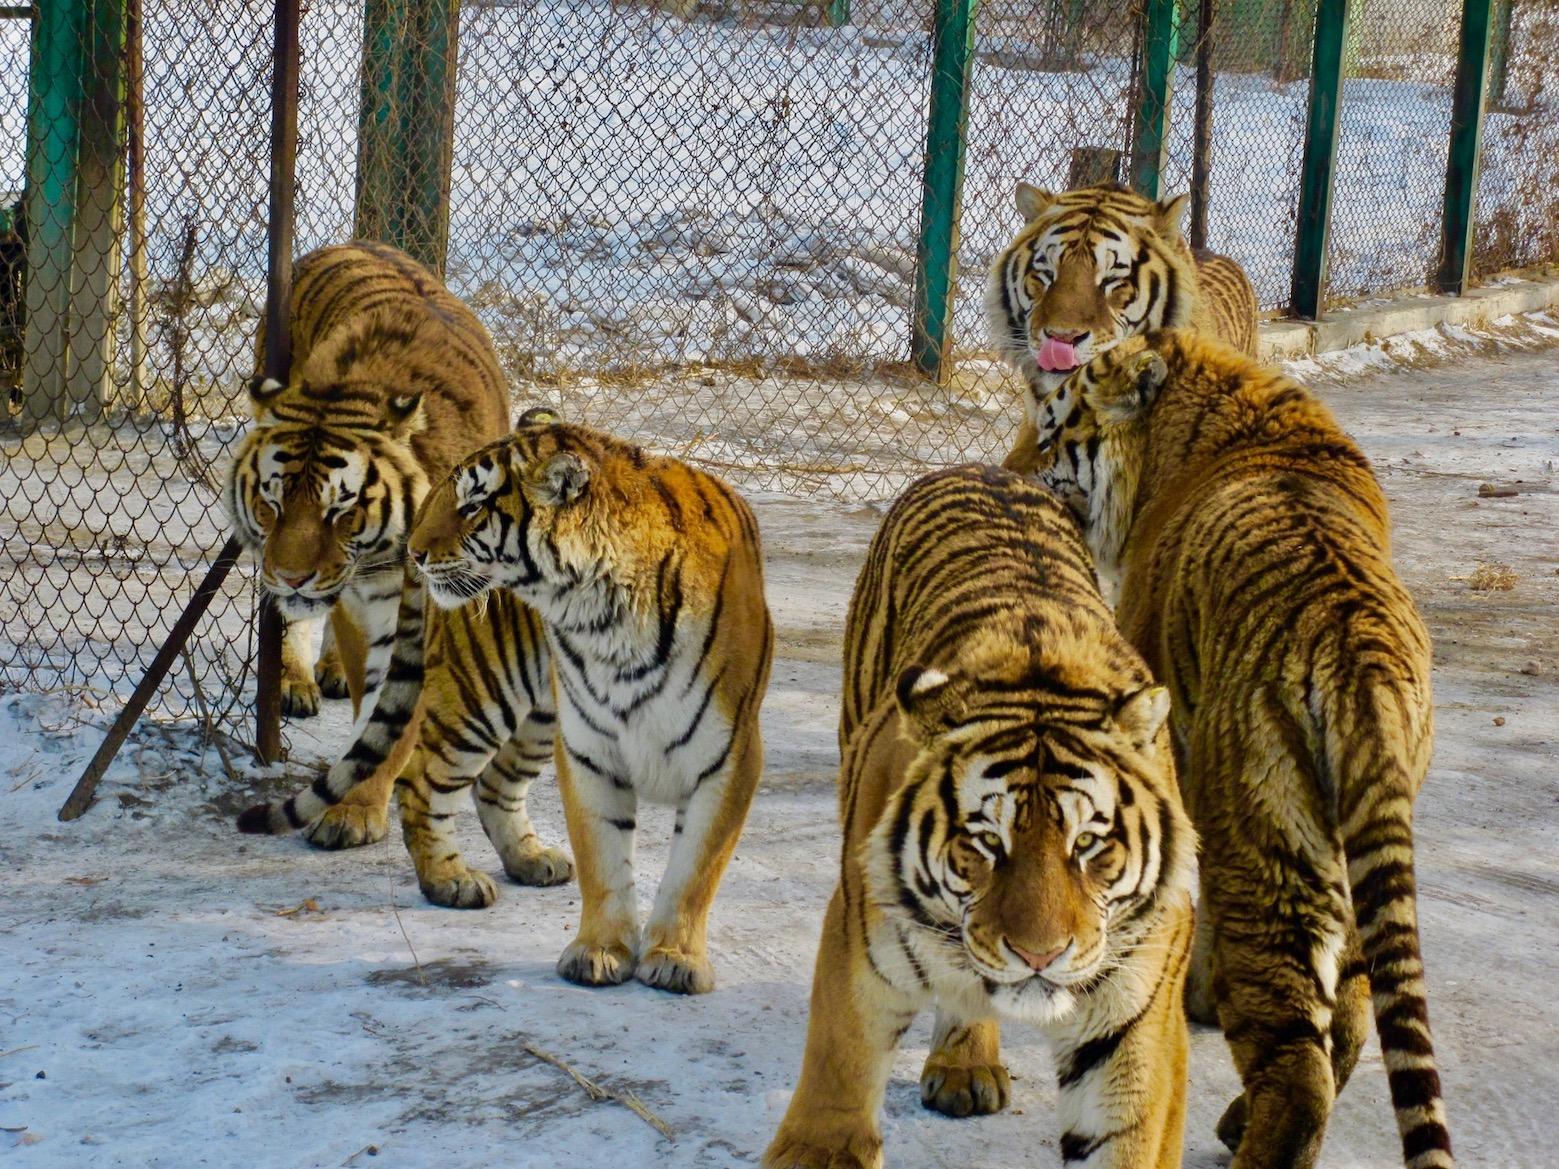 Siberian Tiger Park Harbin Heilongjiang province China